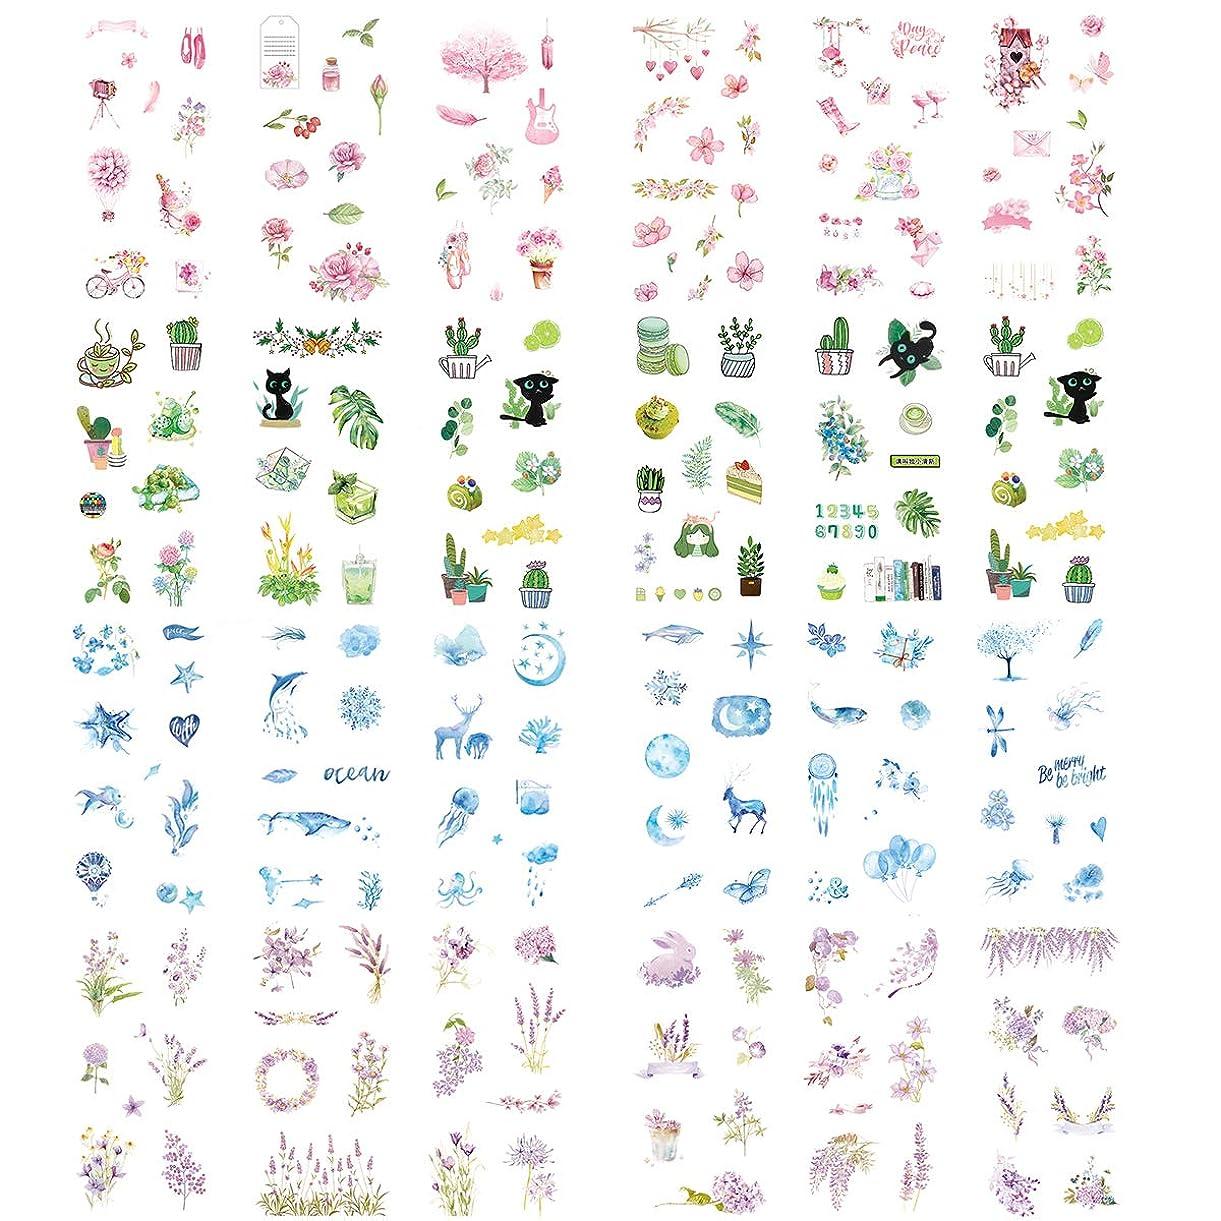 Kawaii Washi Stickers (Assorted 24 Sheets) Rose Sakura Pink Flower Green Plants Marine Life Ocean Starfish Whale Moon Starry Sky Balloon Lavender Purple Floral DIY Label for Scrapbooking Journaling lfjoa2285